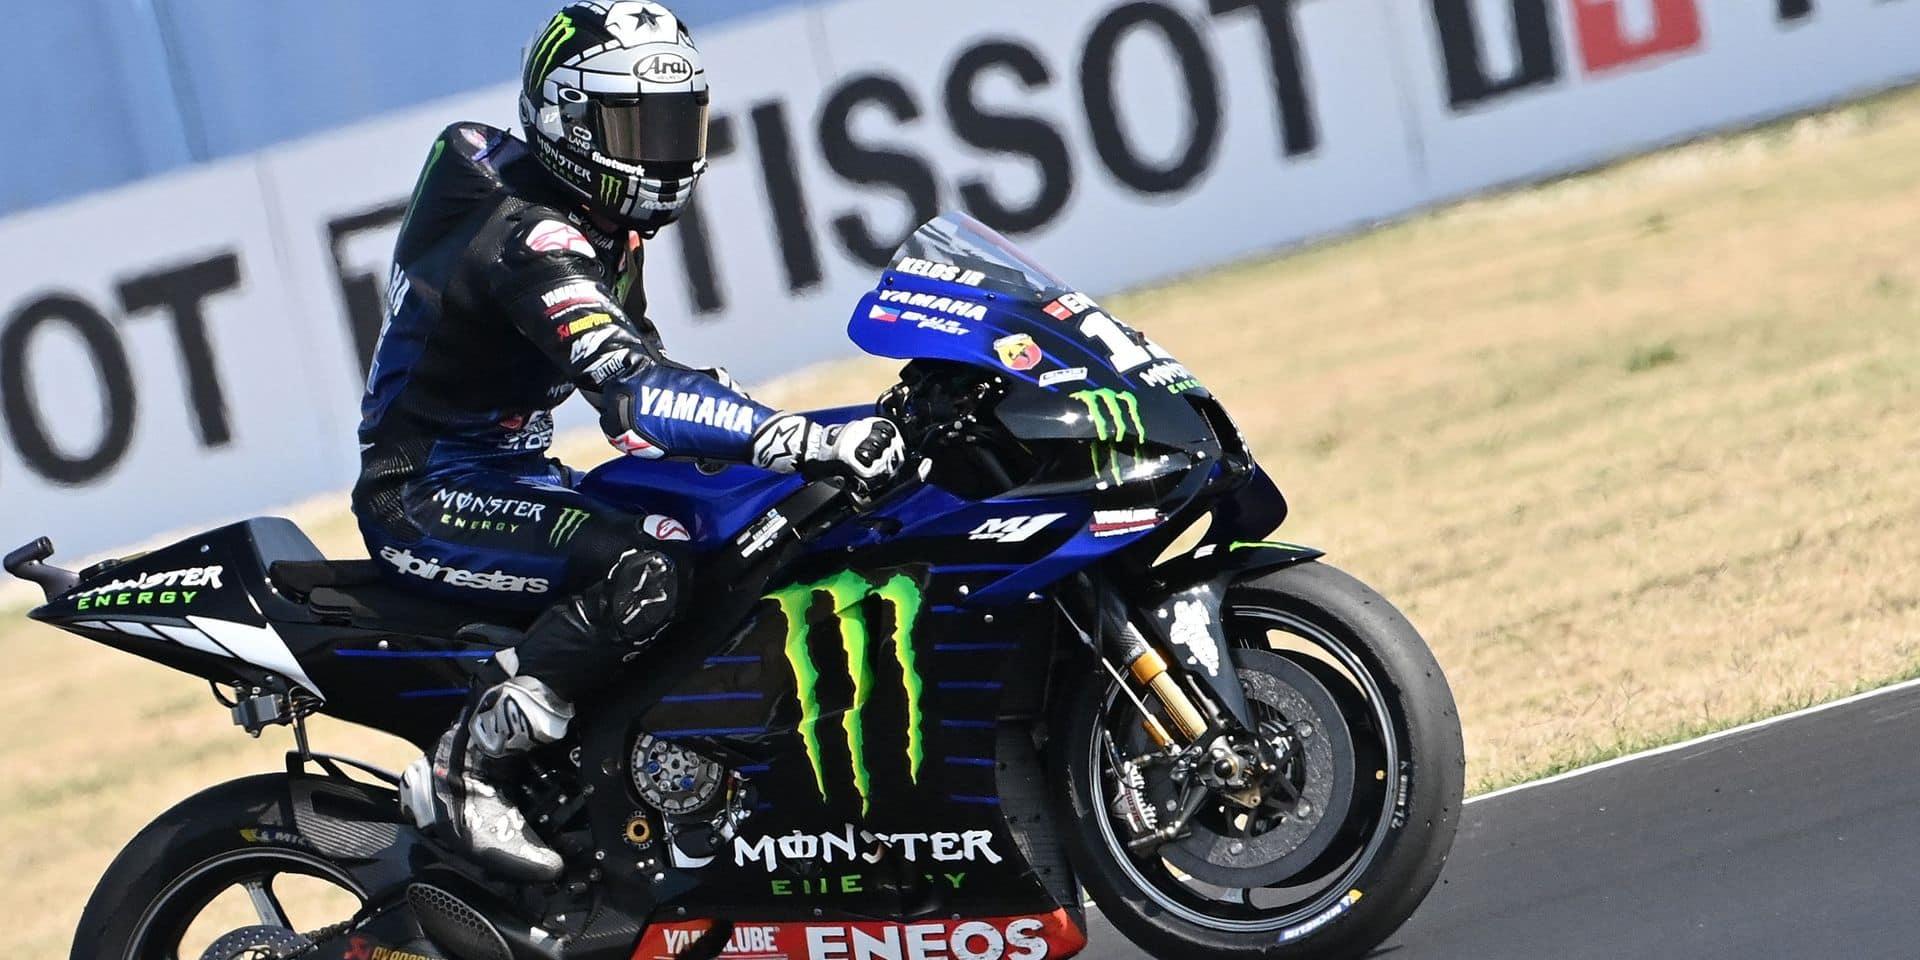 Moto GP: Viñales relance le championnat